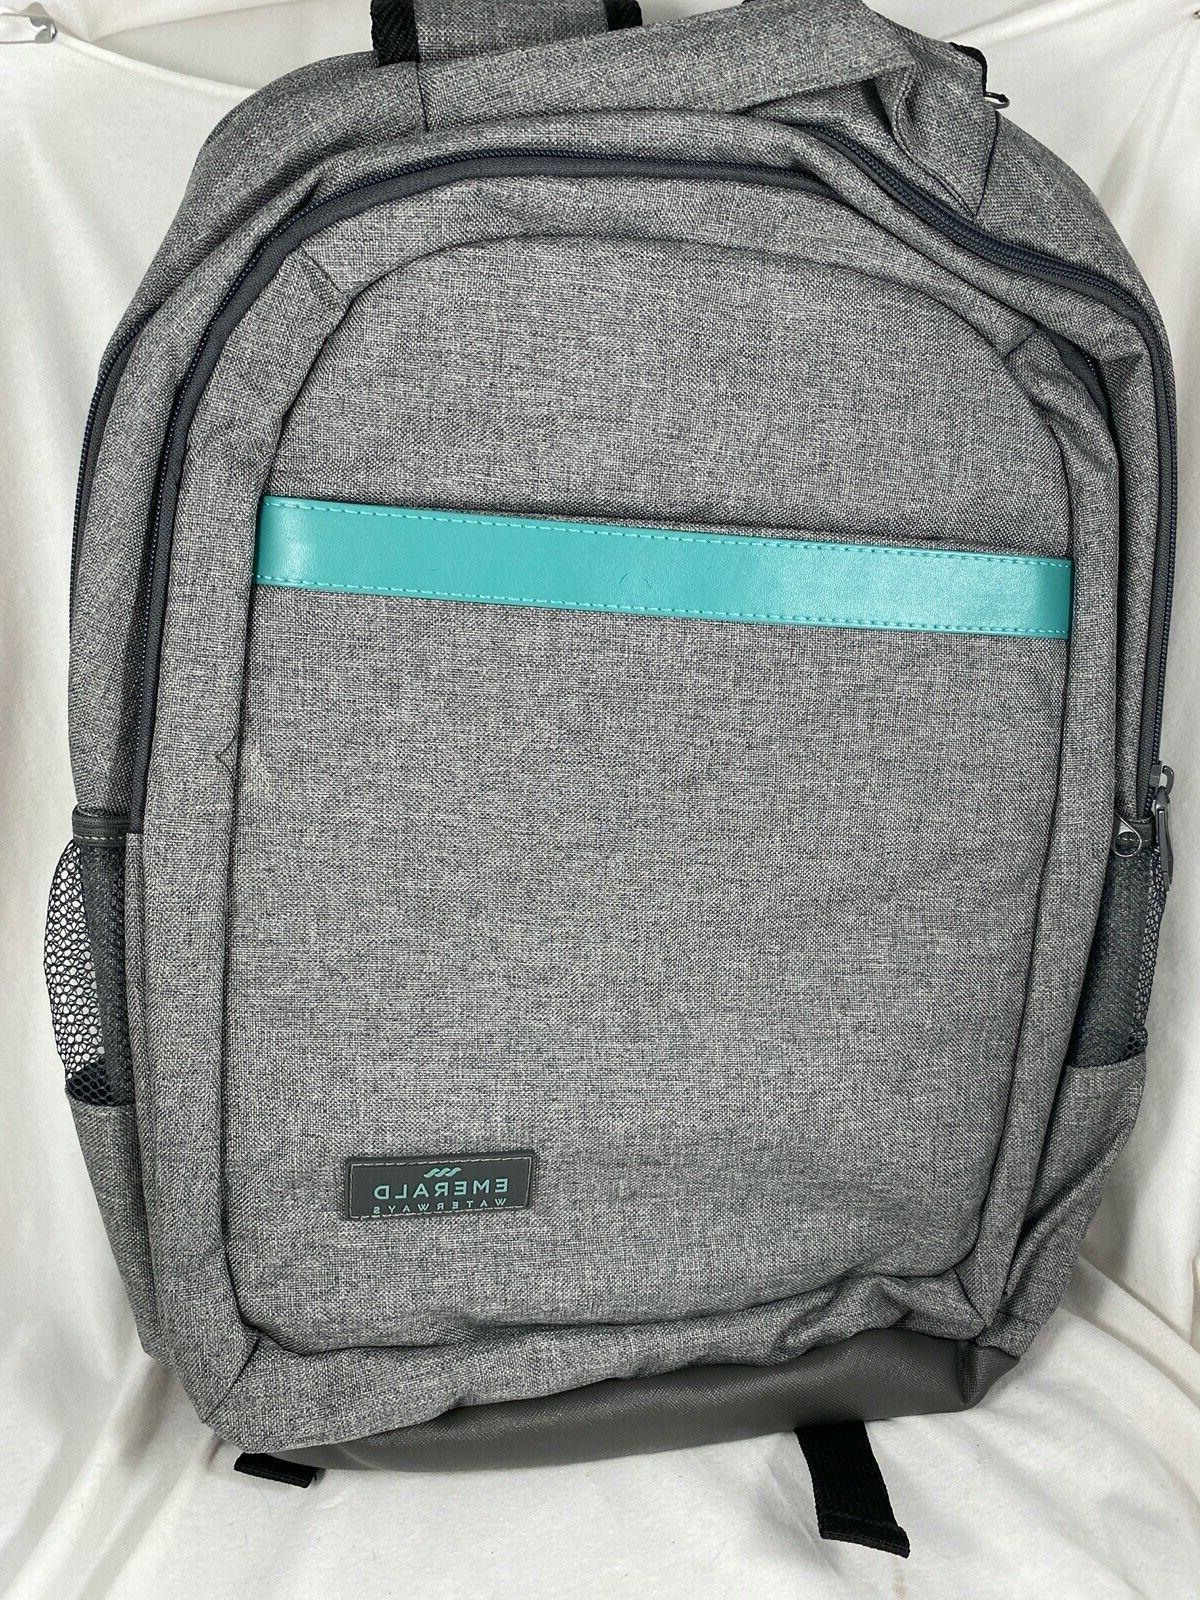 backpack rucksack waterways computer travel daypack carry